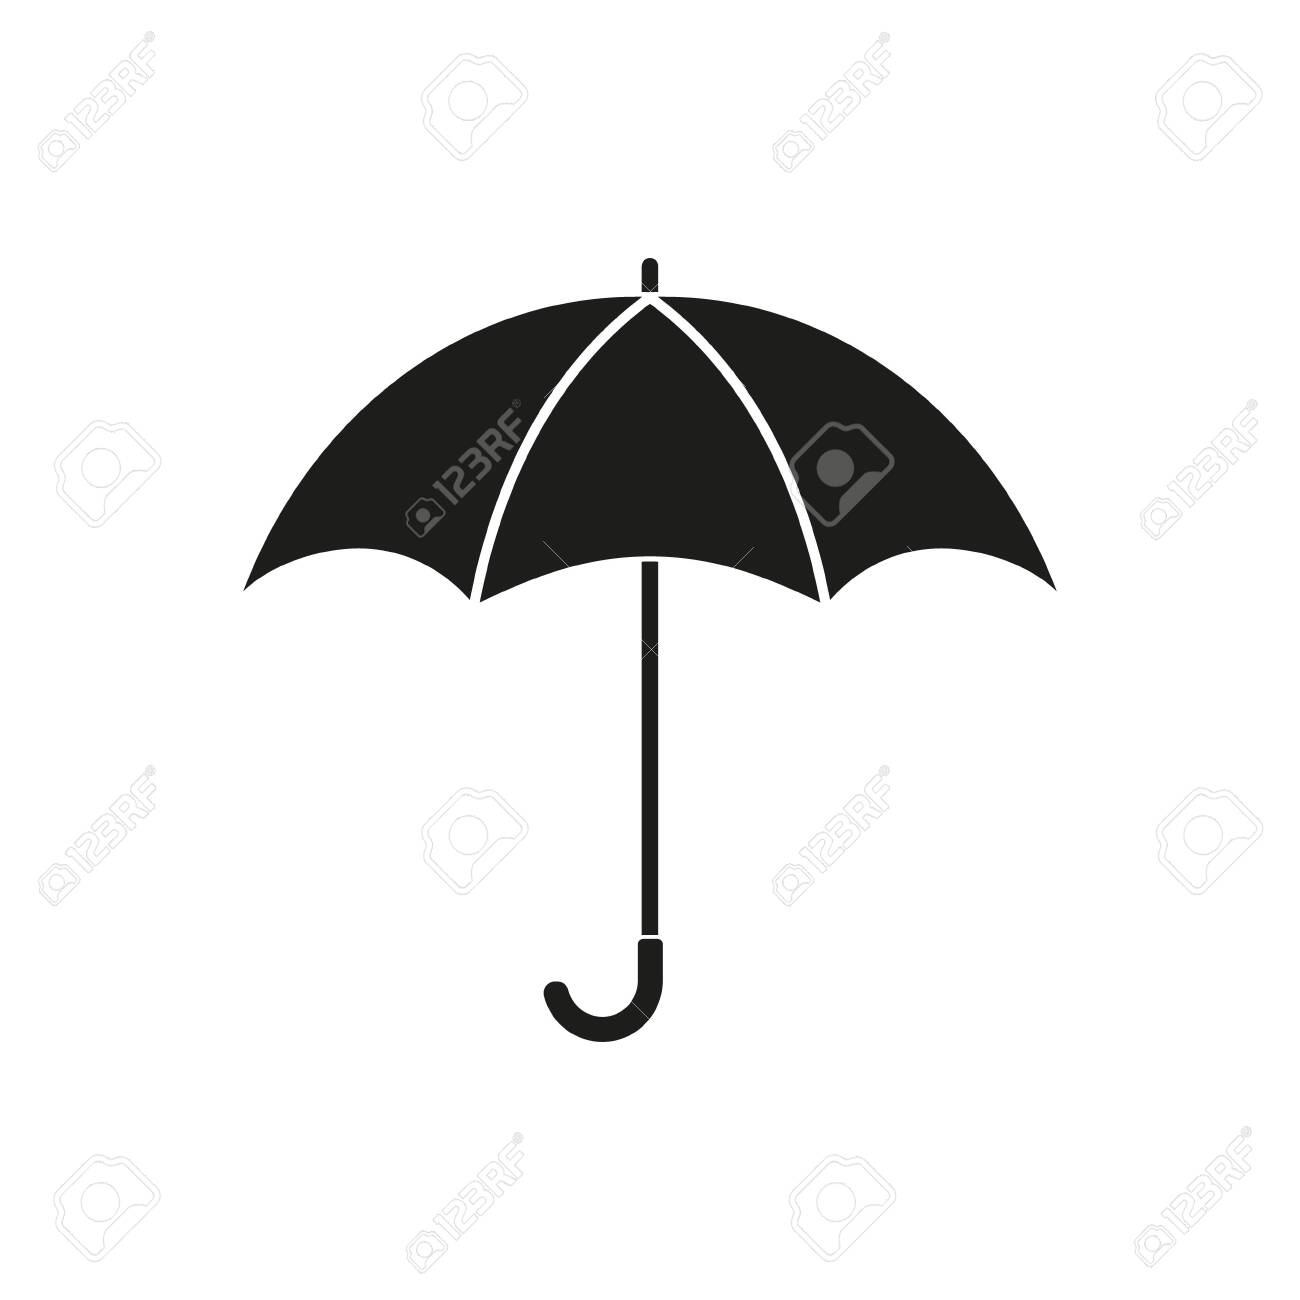 Umbrella symbol on the white background. Vector illustration. - 139890838